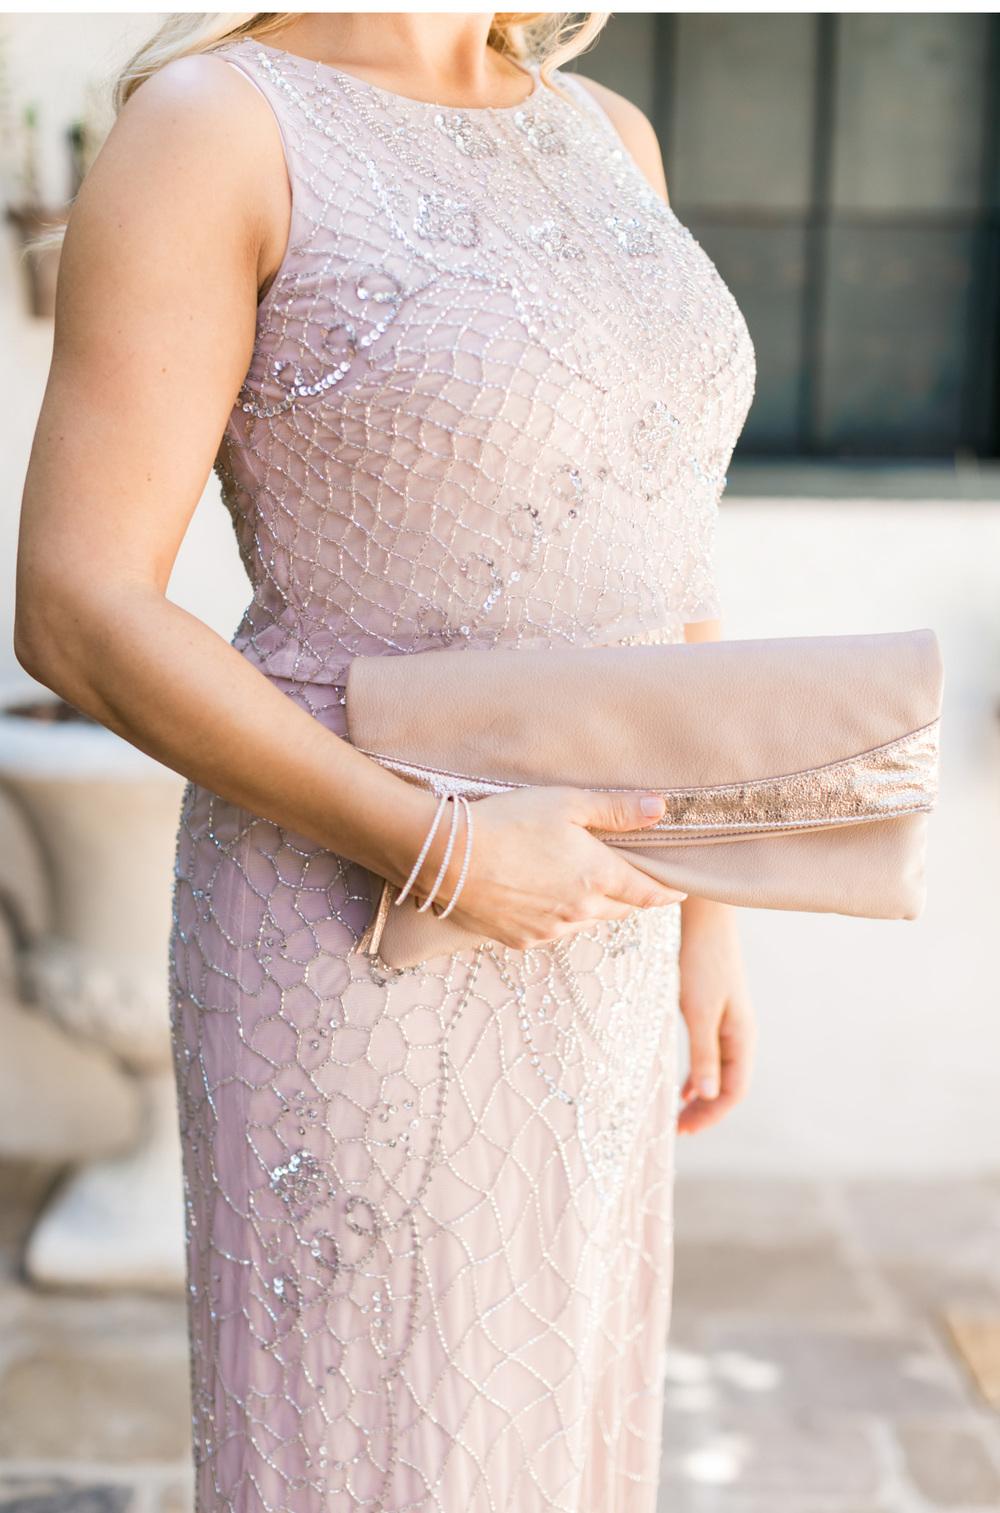 San-Juan-Capistrano-Wedding-Style-Me-Pretty-Natalie-Schutt-Photography_11.jpg